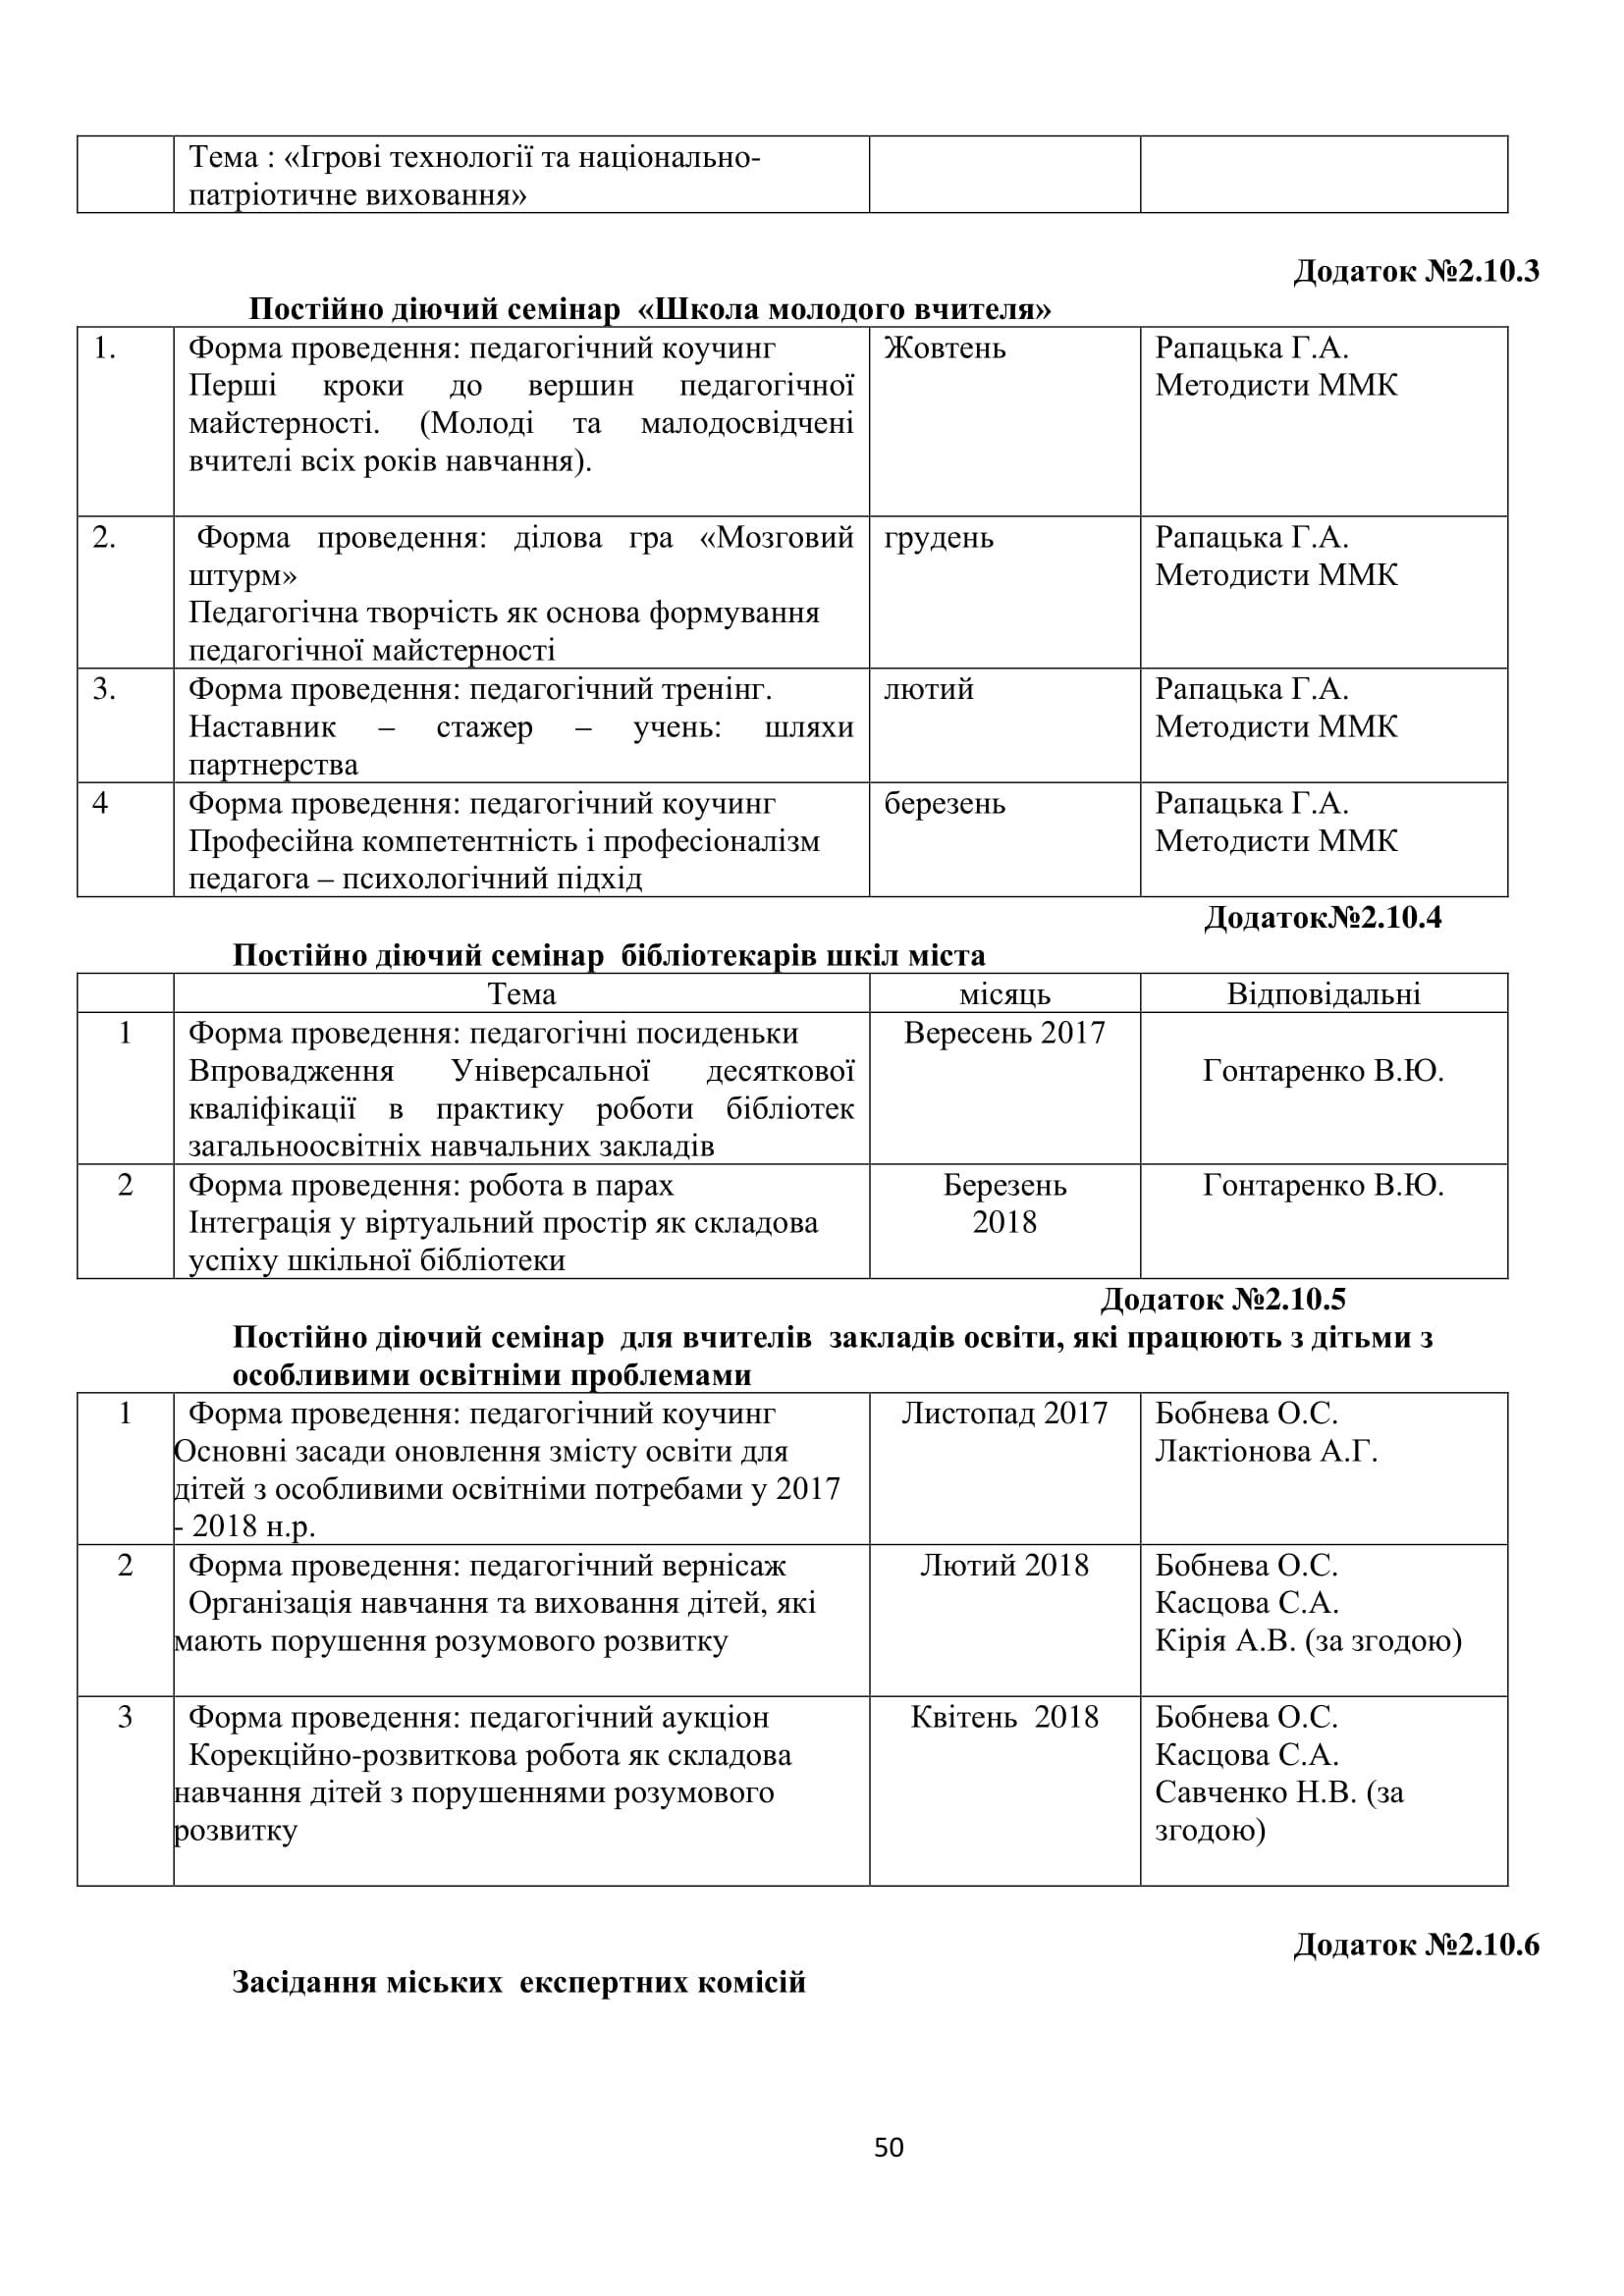 2017-2018 - ММК план роботи-51